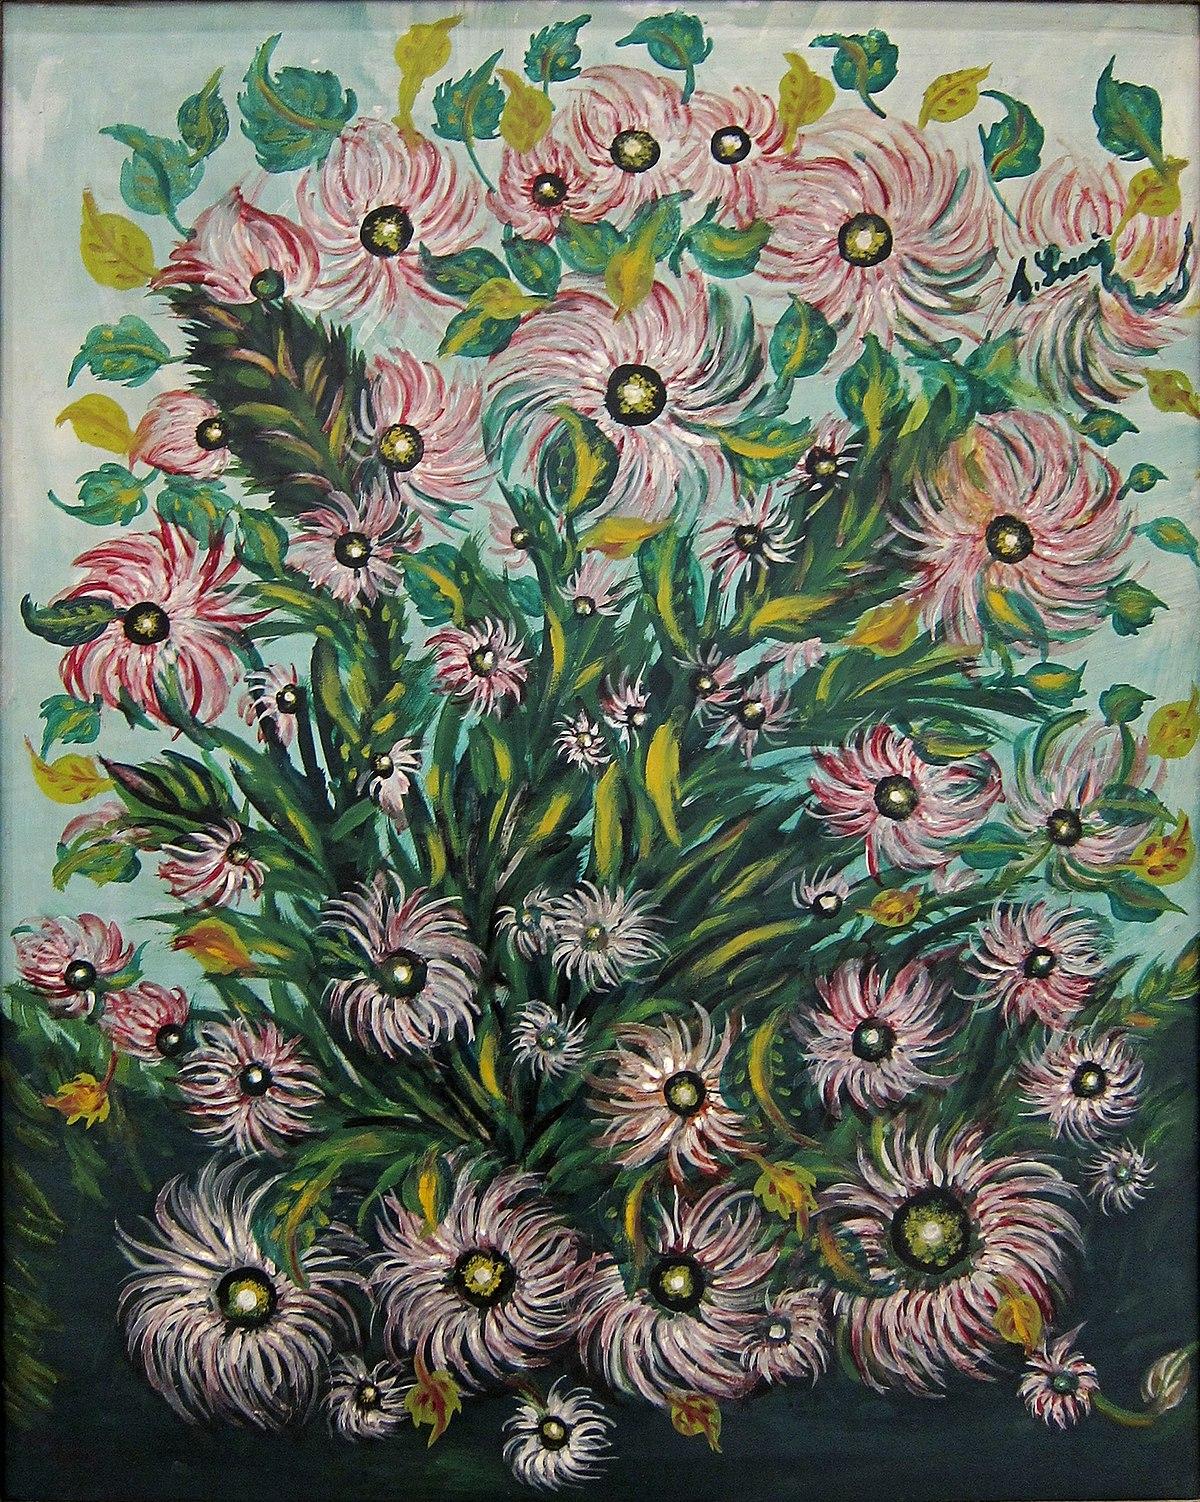 S raphine louis wikipedia wolna encyklopedia for Bouquet de fleurs wiki